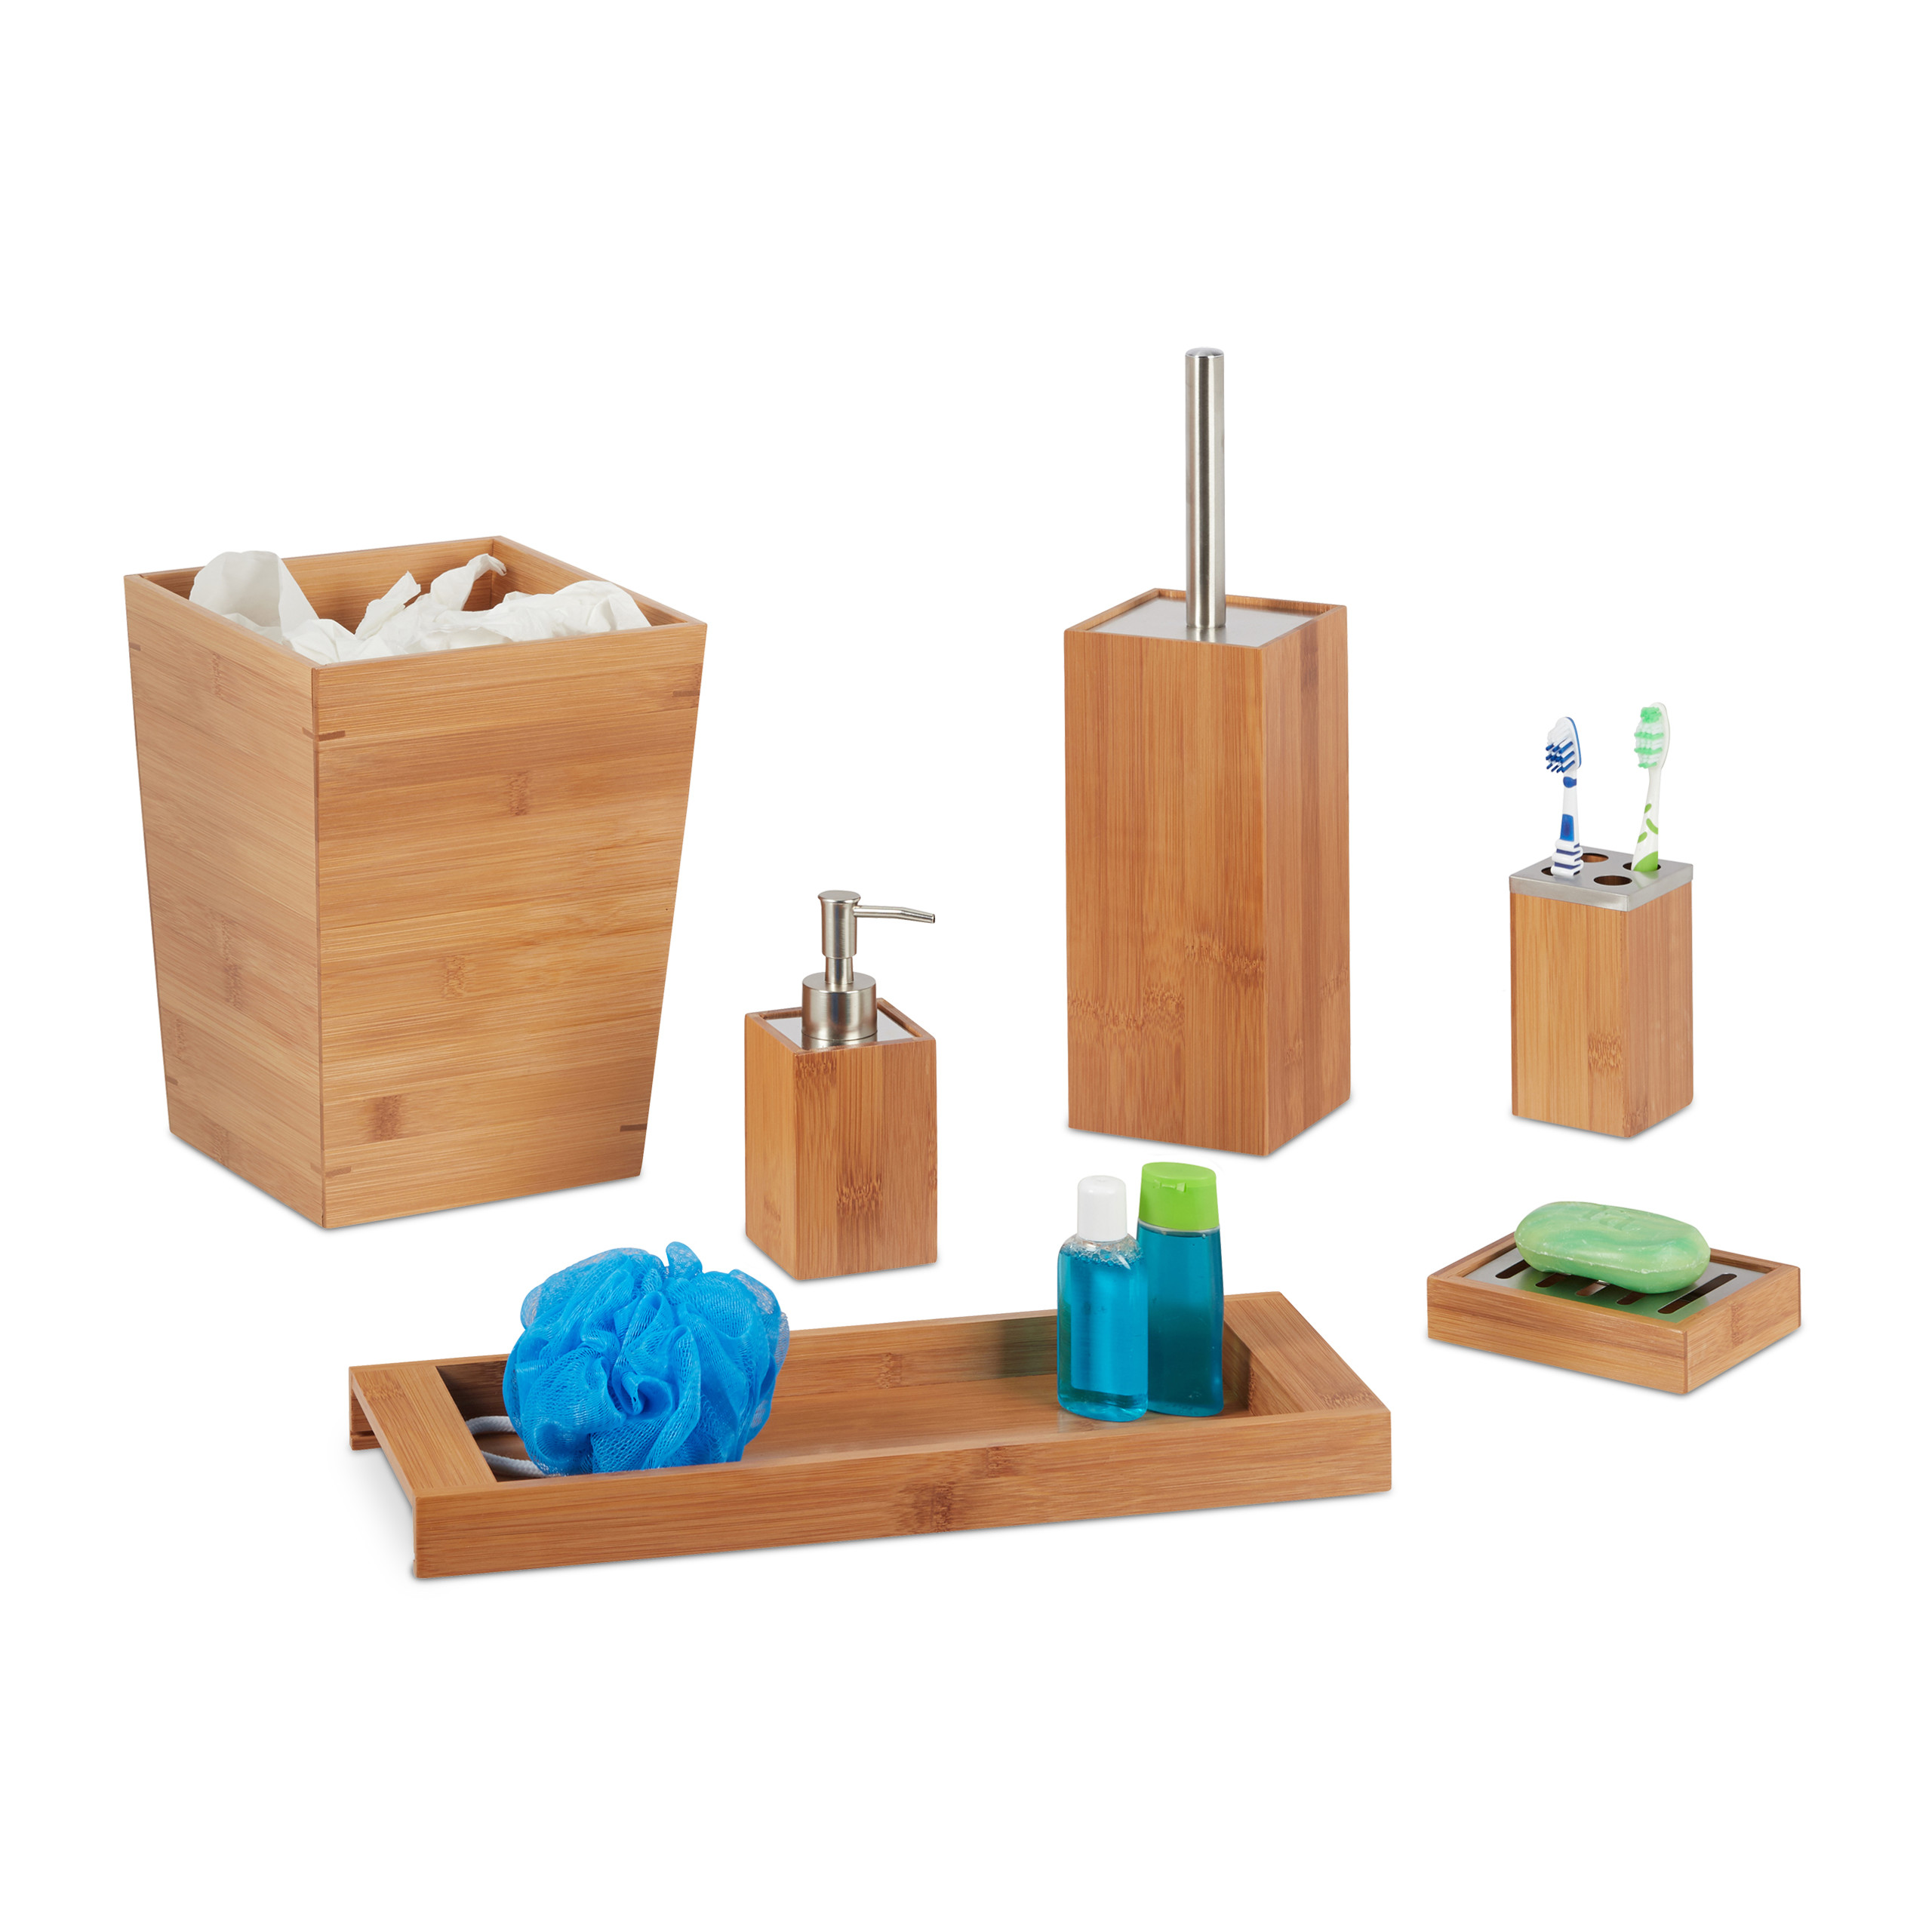 marvellous bamboo bathroom accessories | 6-Piece Bamboo Bathroom Accessory Set with Toilet Brush ...